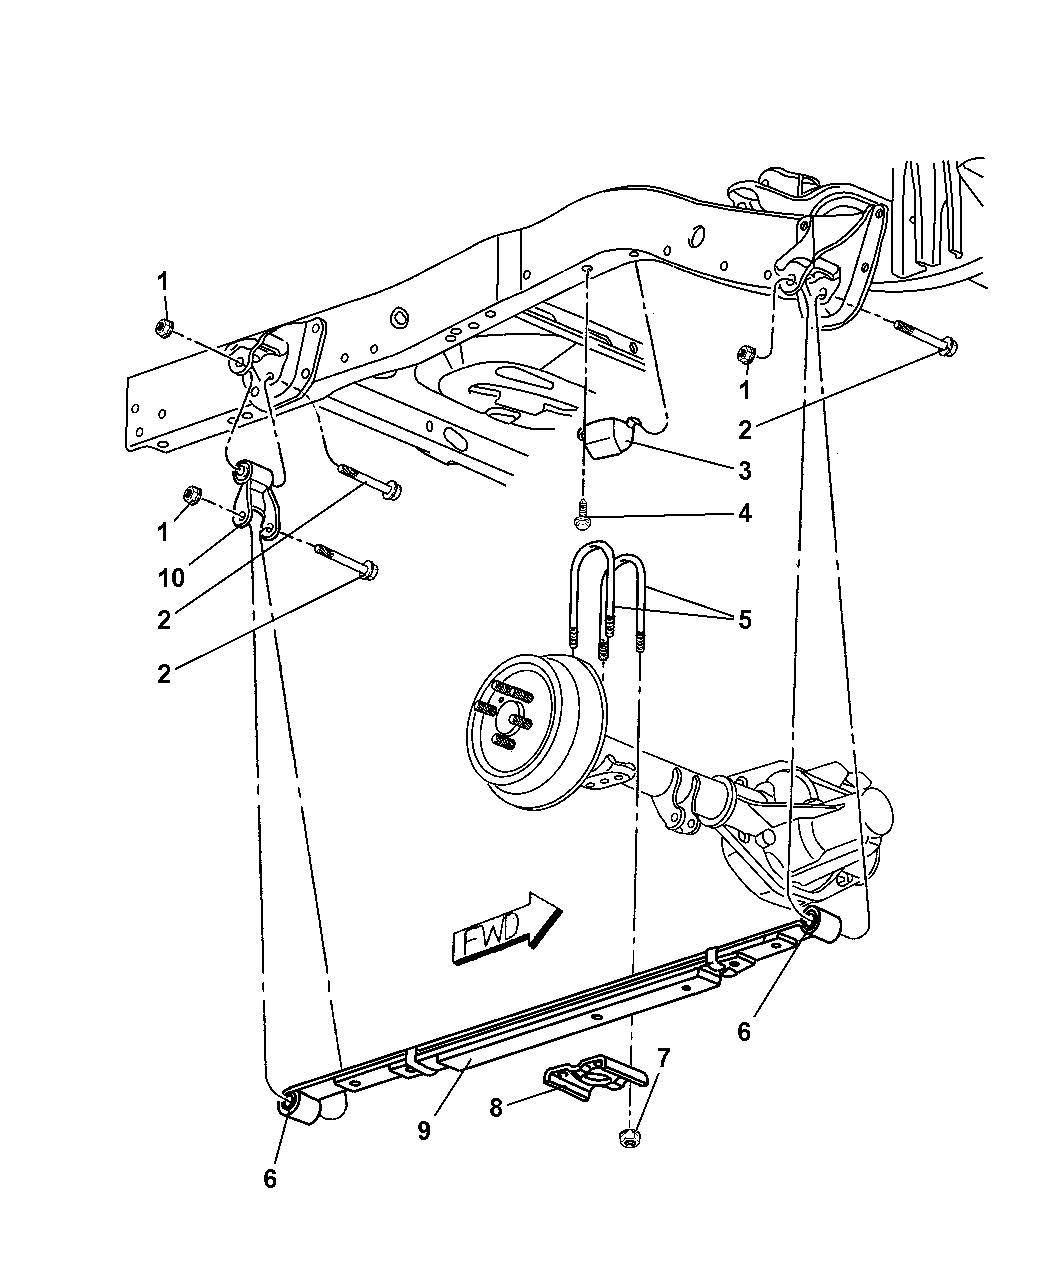 2003 Dodge Dakota Suspension - Rear Leaf Springs